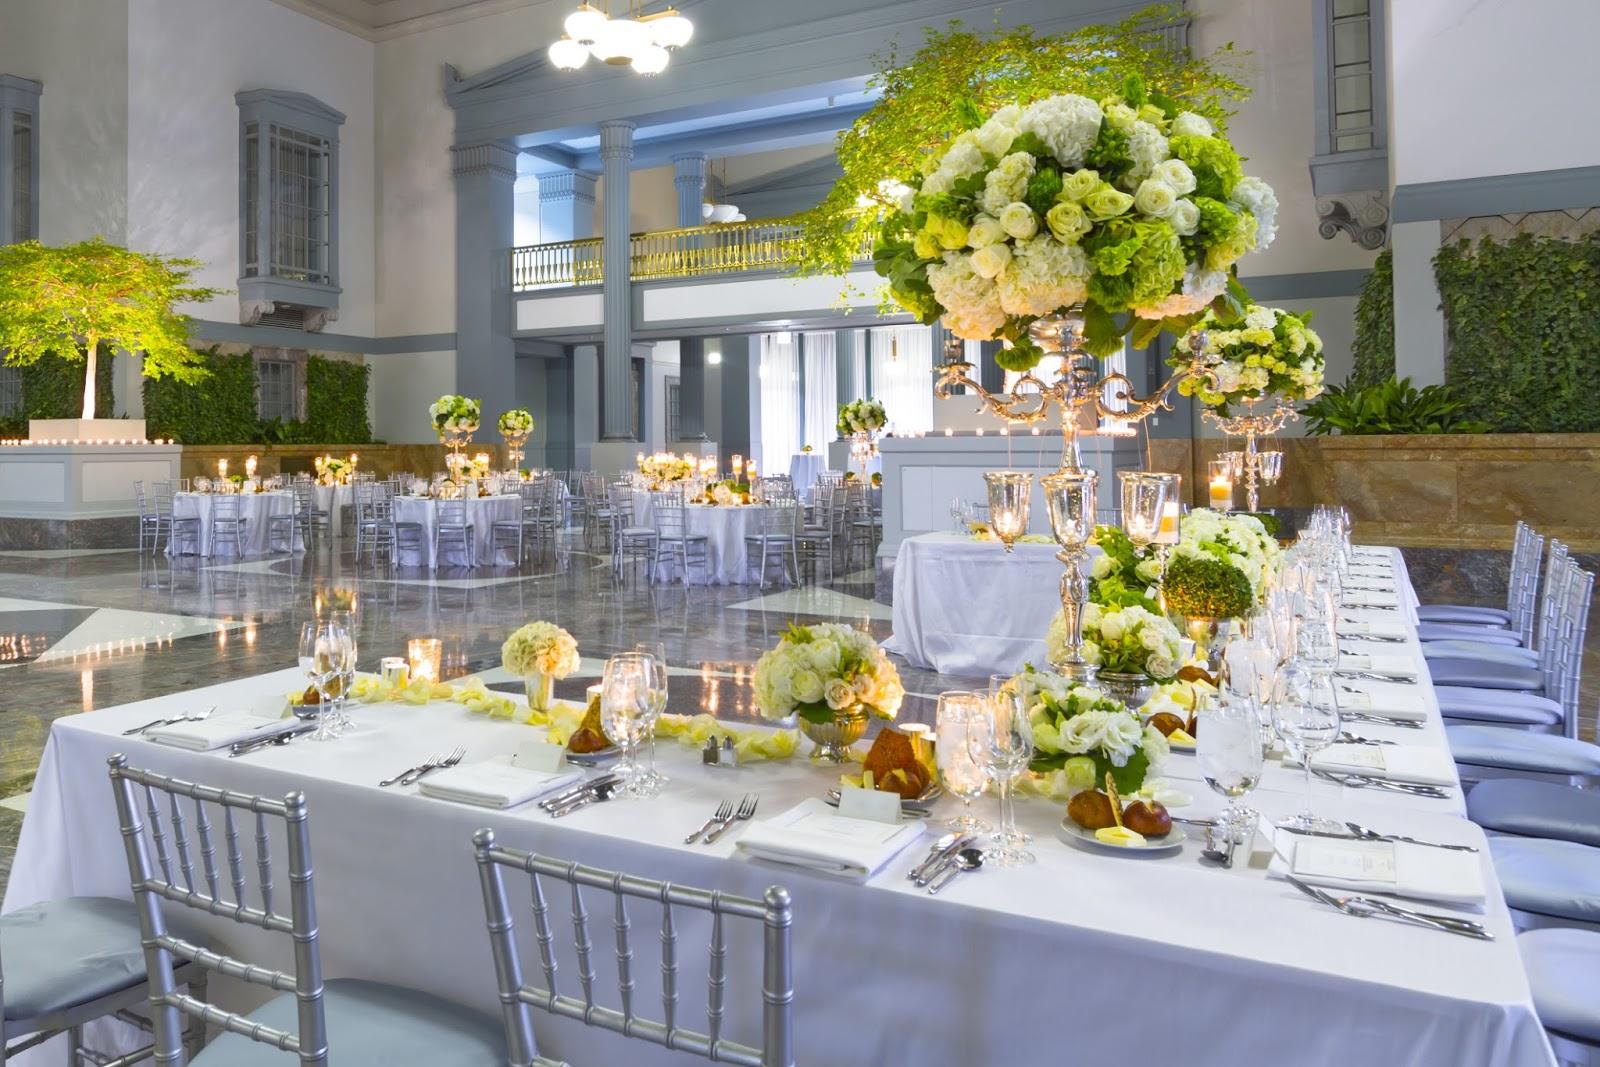 Wedding Decorations Re Re Use Your Wedding Decorations Platinum Wedding Events